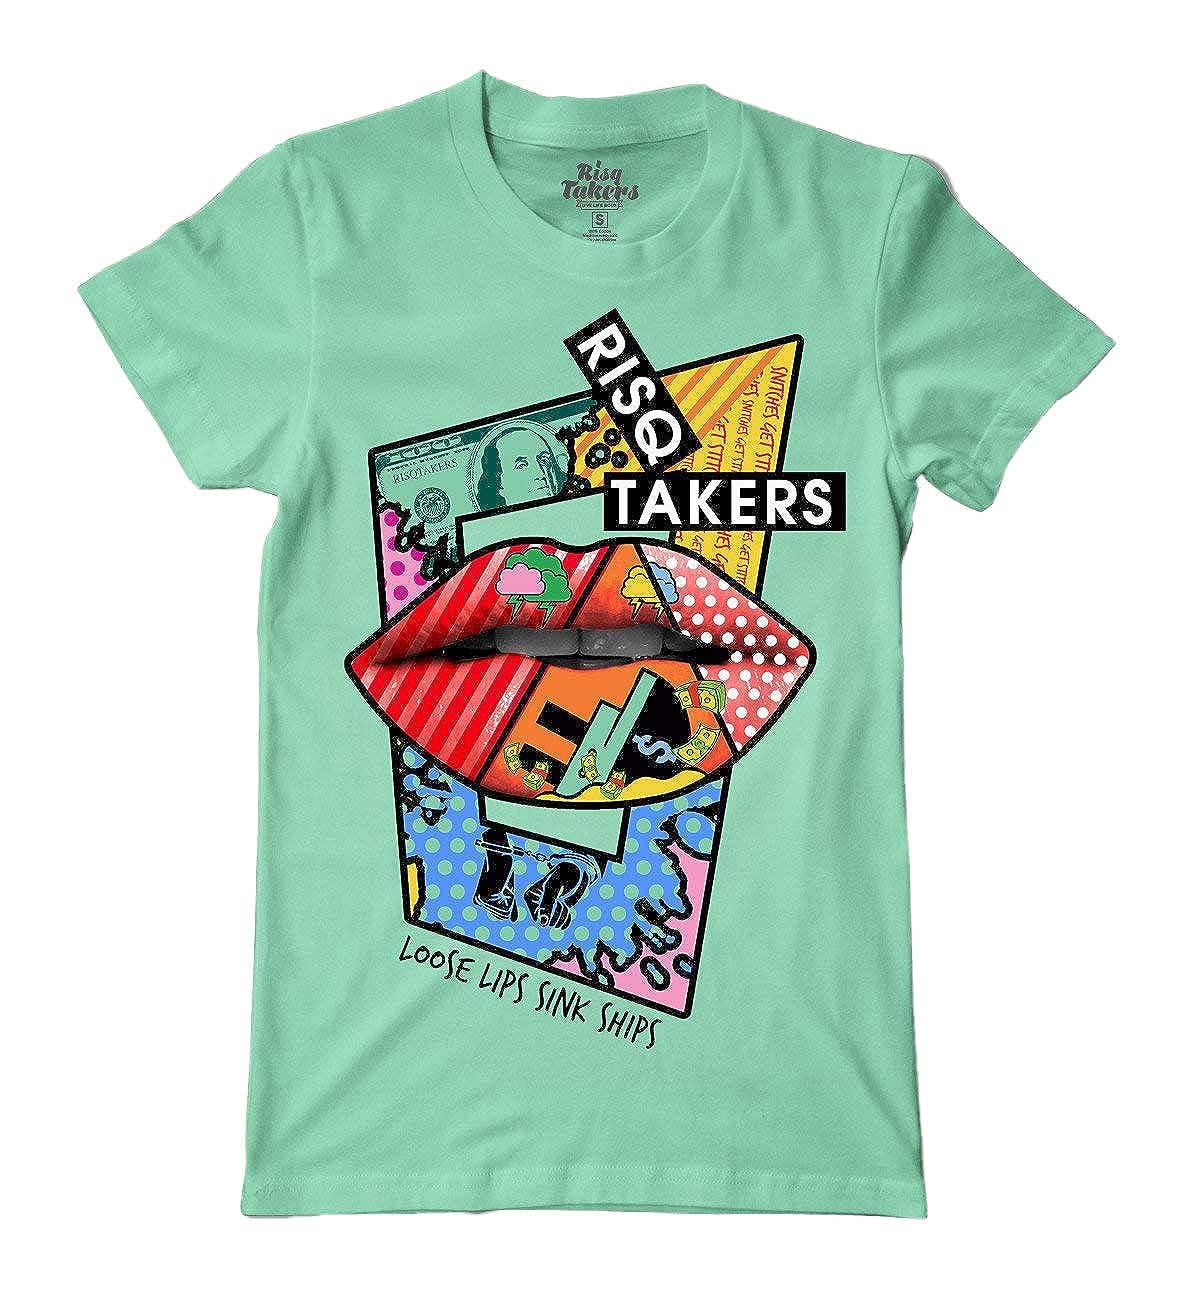 Risq Takers Loose Lips T-Shirt